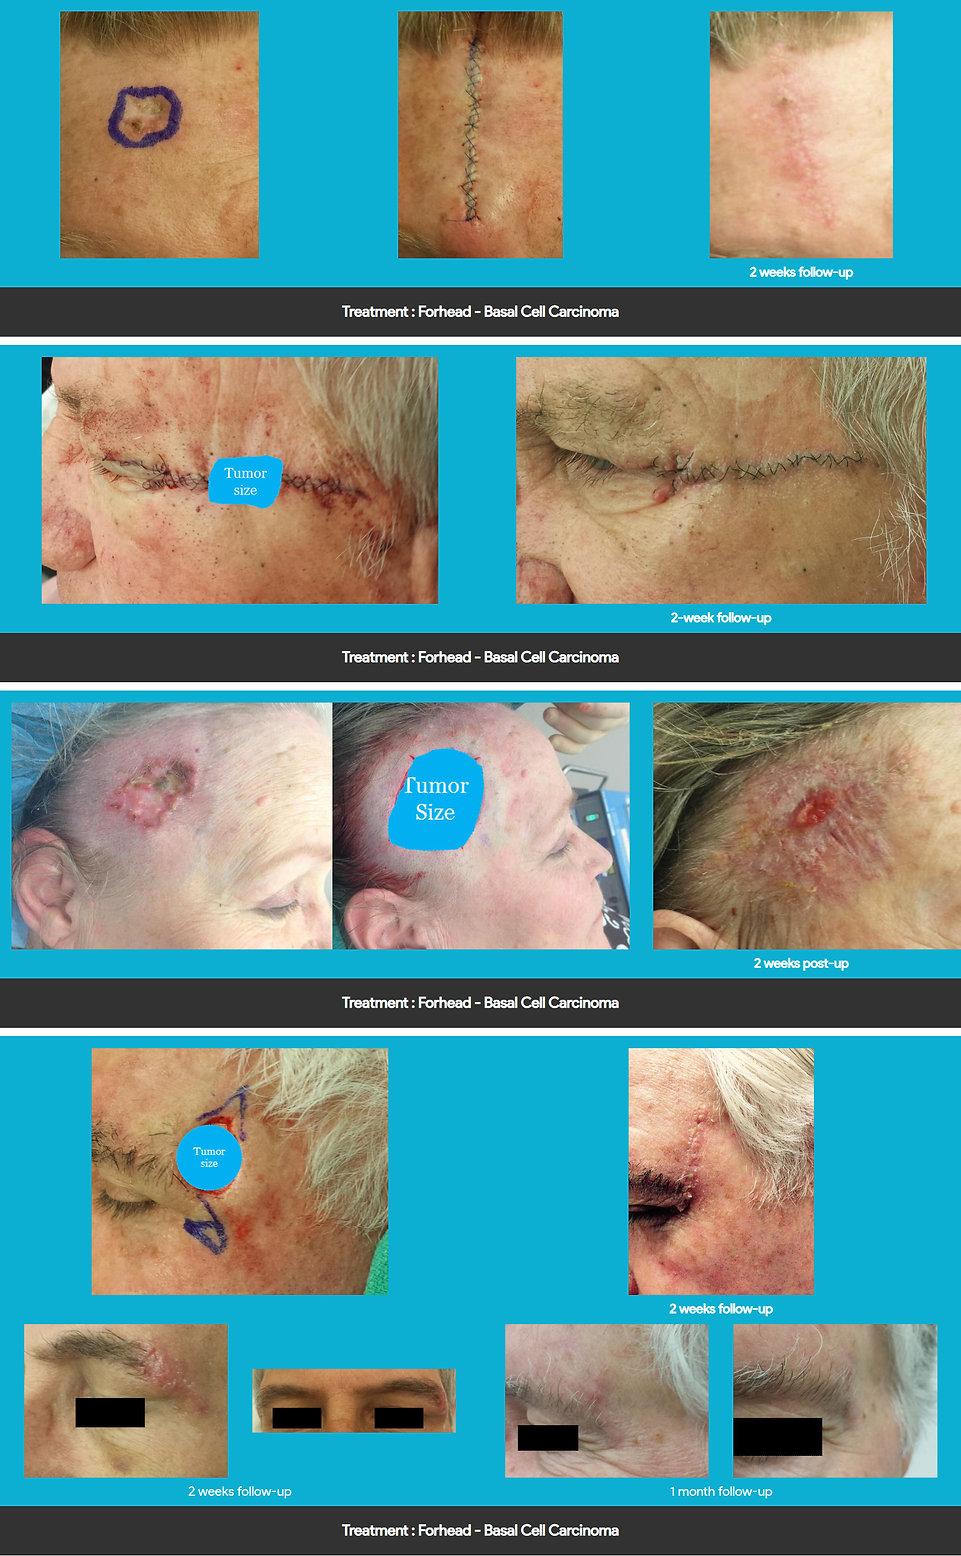 mimohs forehead treatment.jpg